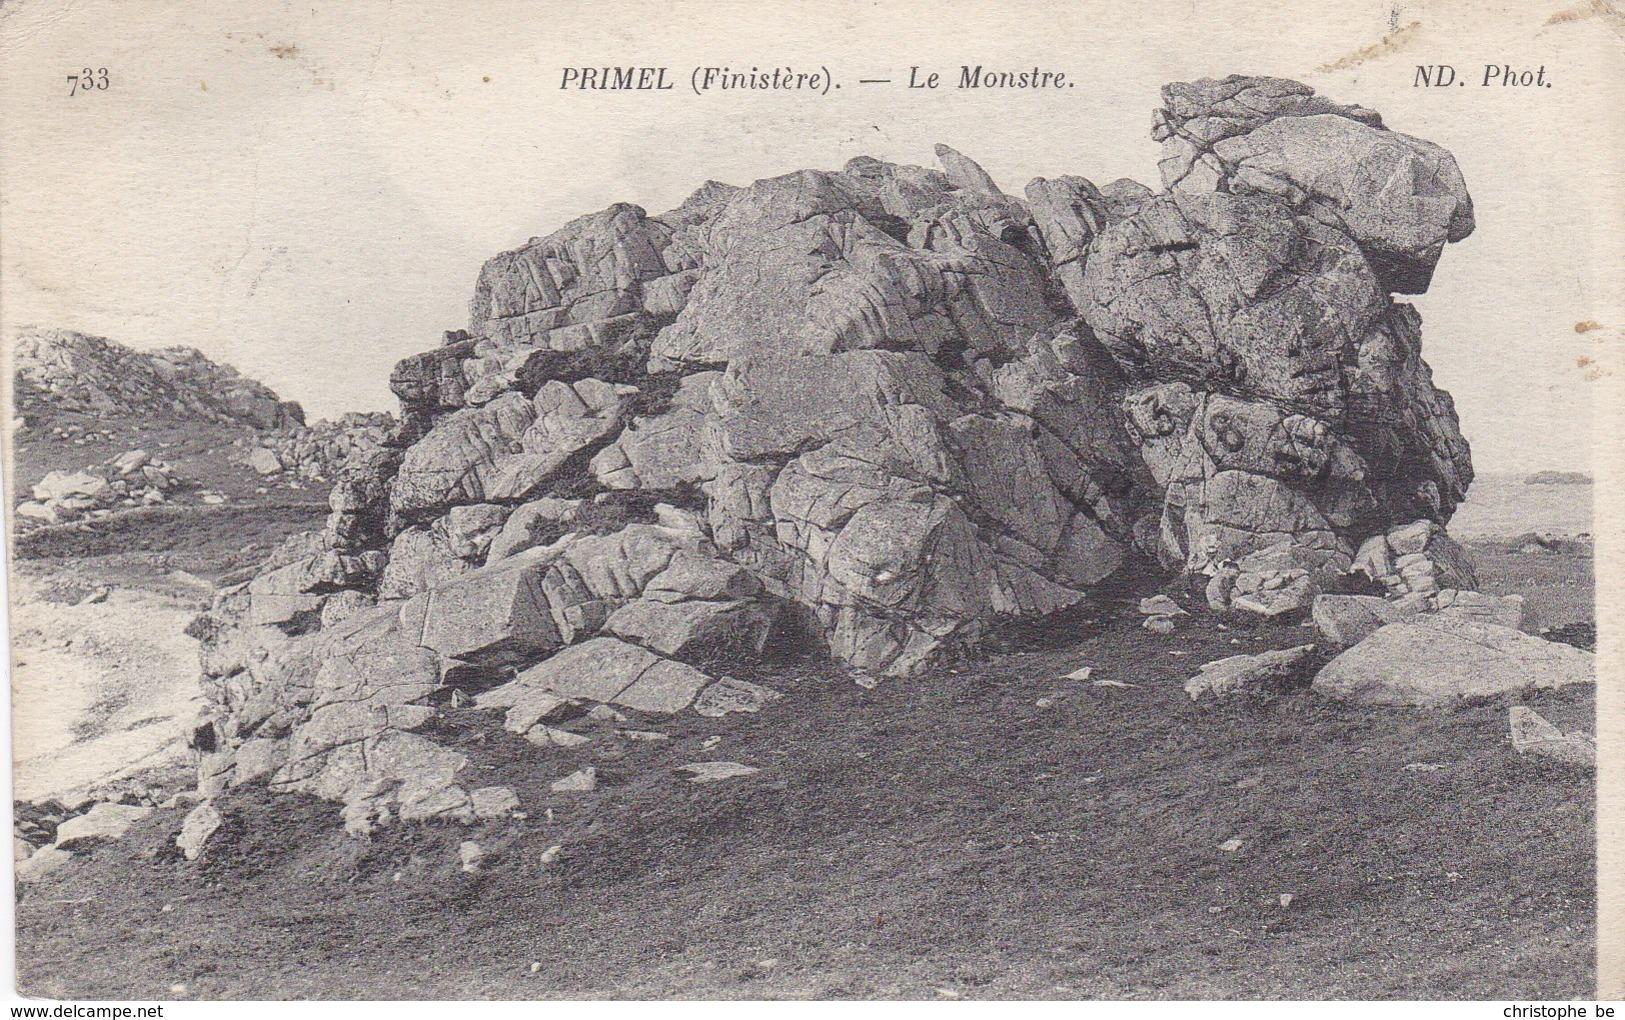 CPA Primel, Finistère, Le Monstre (pk34267) - Primel